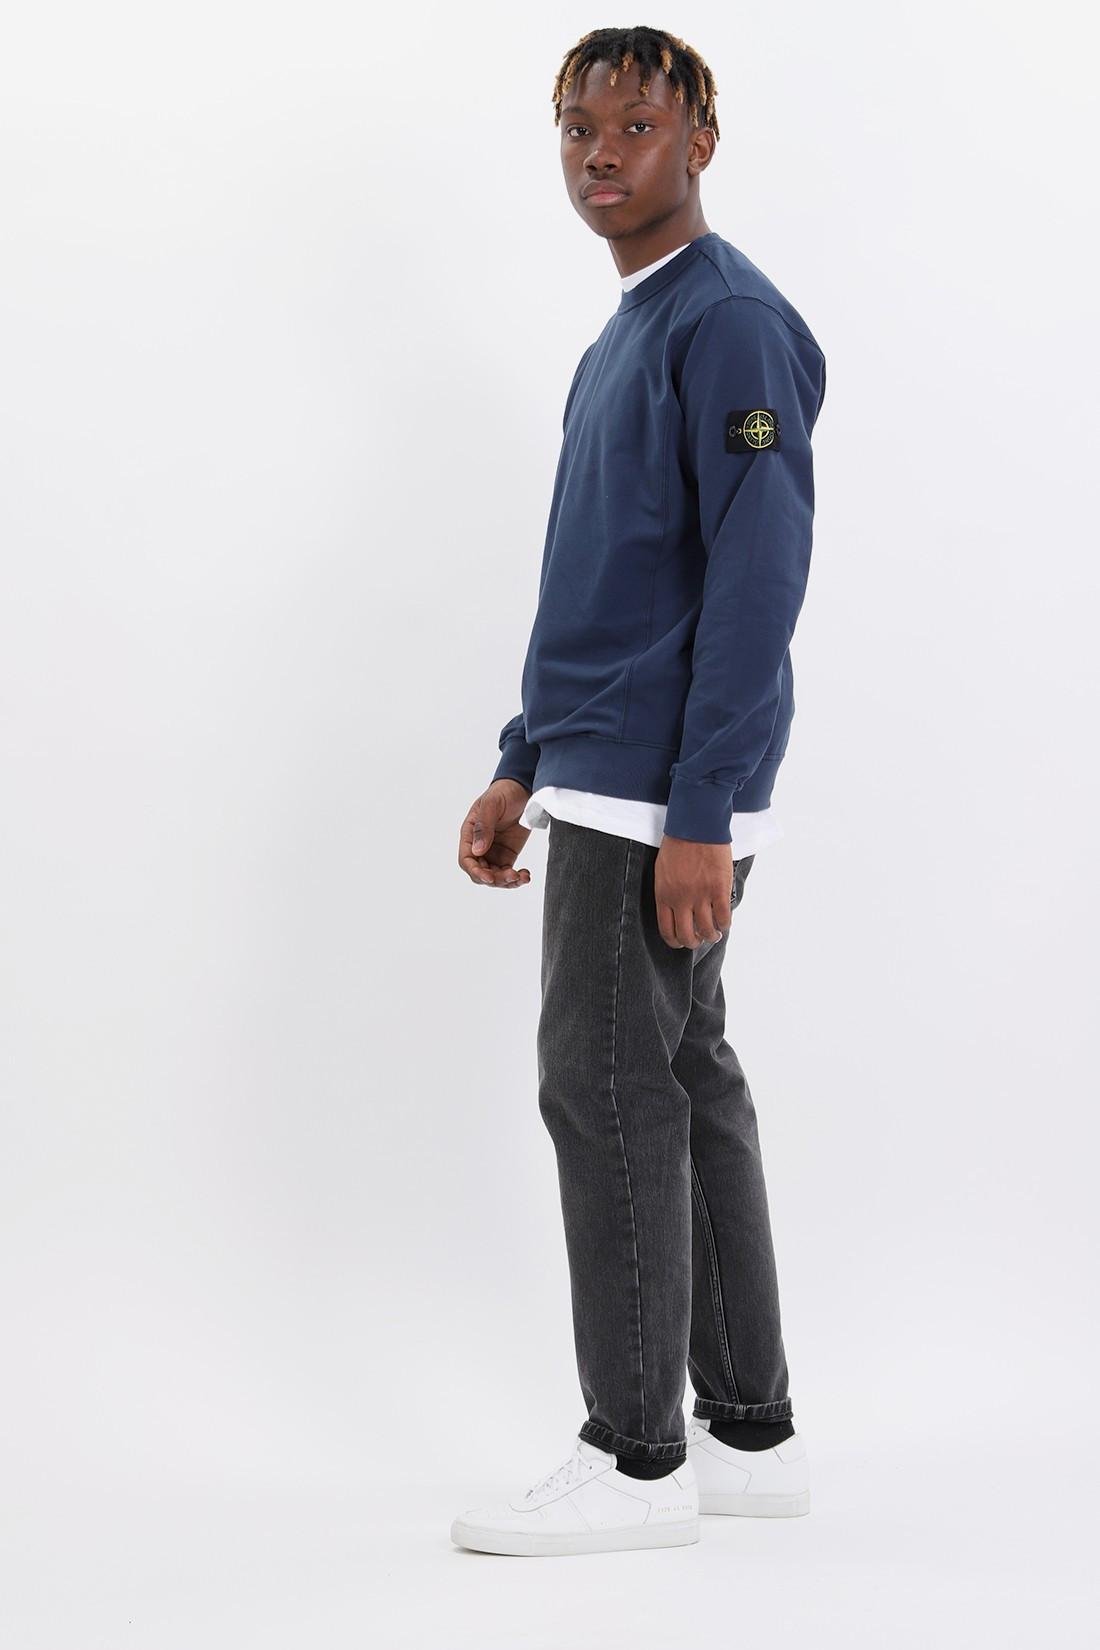 2de10c10a827 Stone island 61452 sweat shirt v0028 Bleu marine - GRADUATE STORE